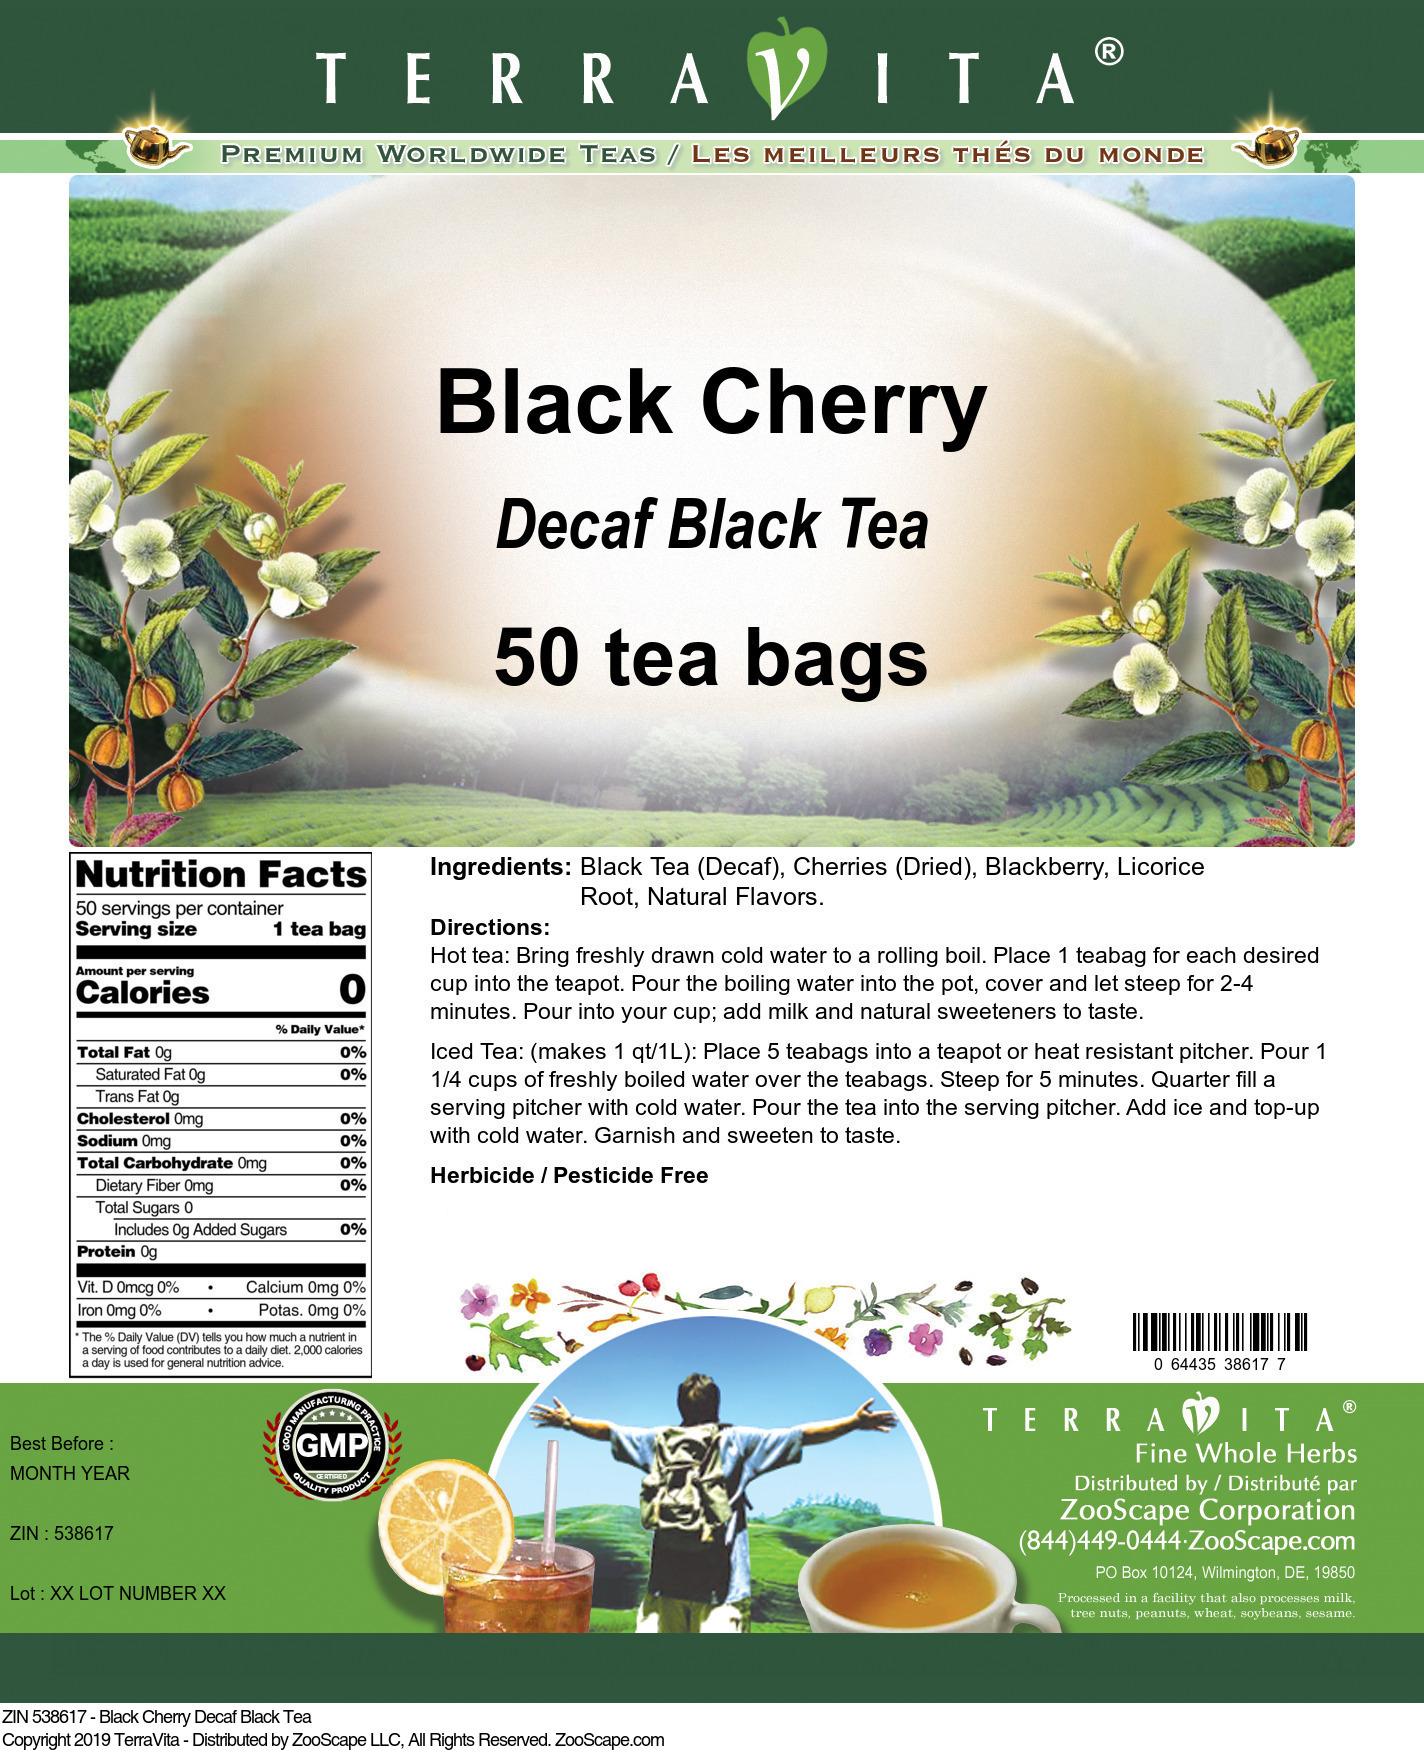 Black Cherry Decaf Black Tea